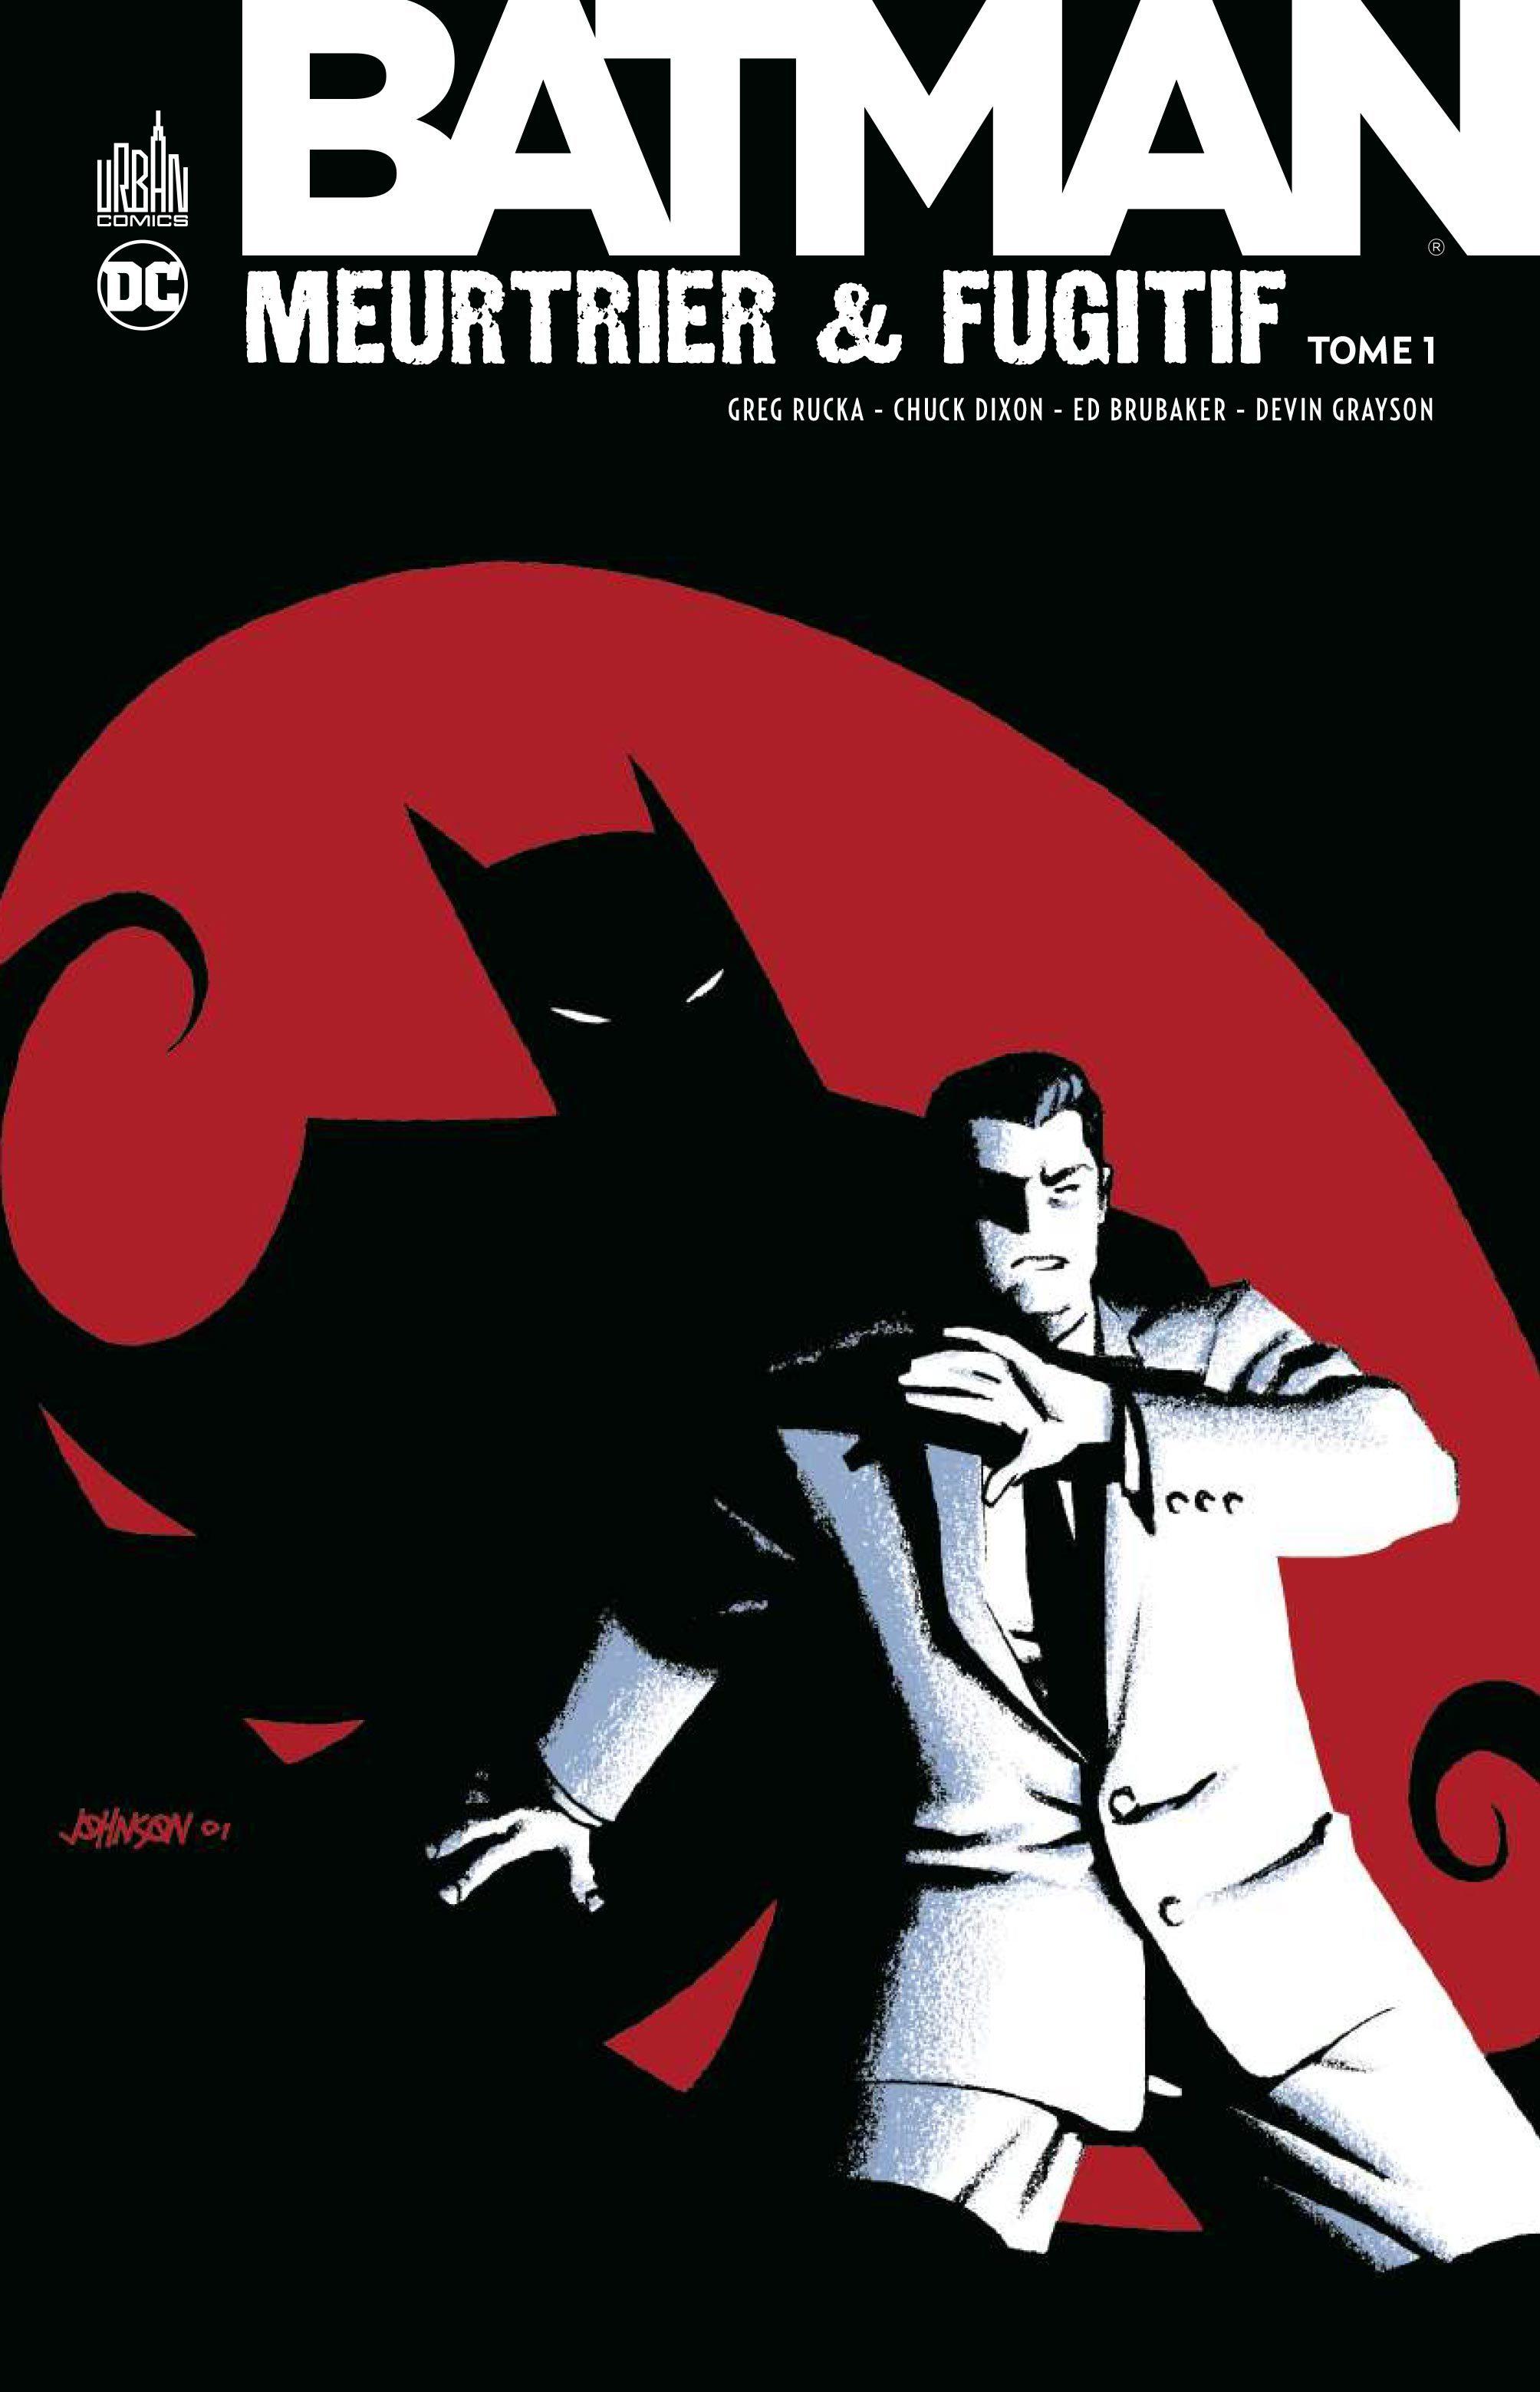 BATMAN MEURTRIER & FUGITIF TOME 1